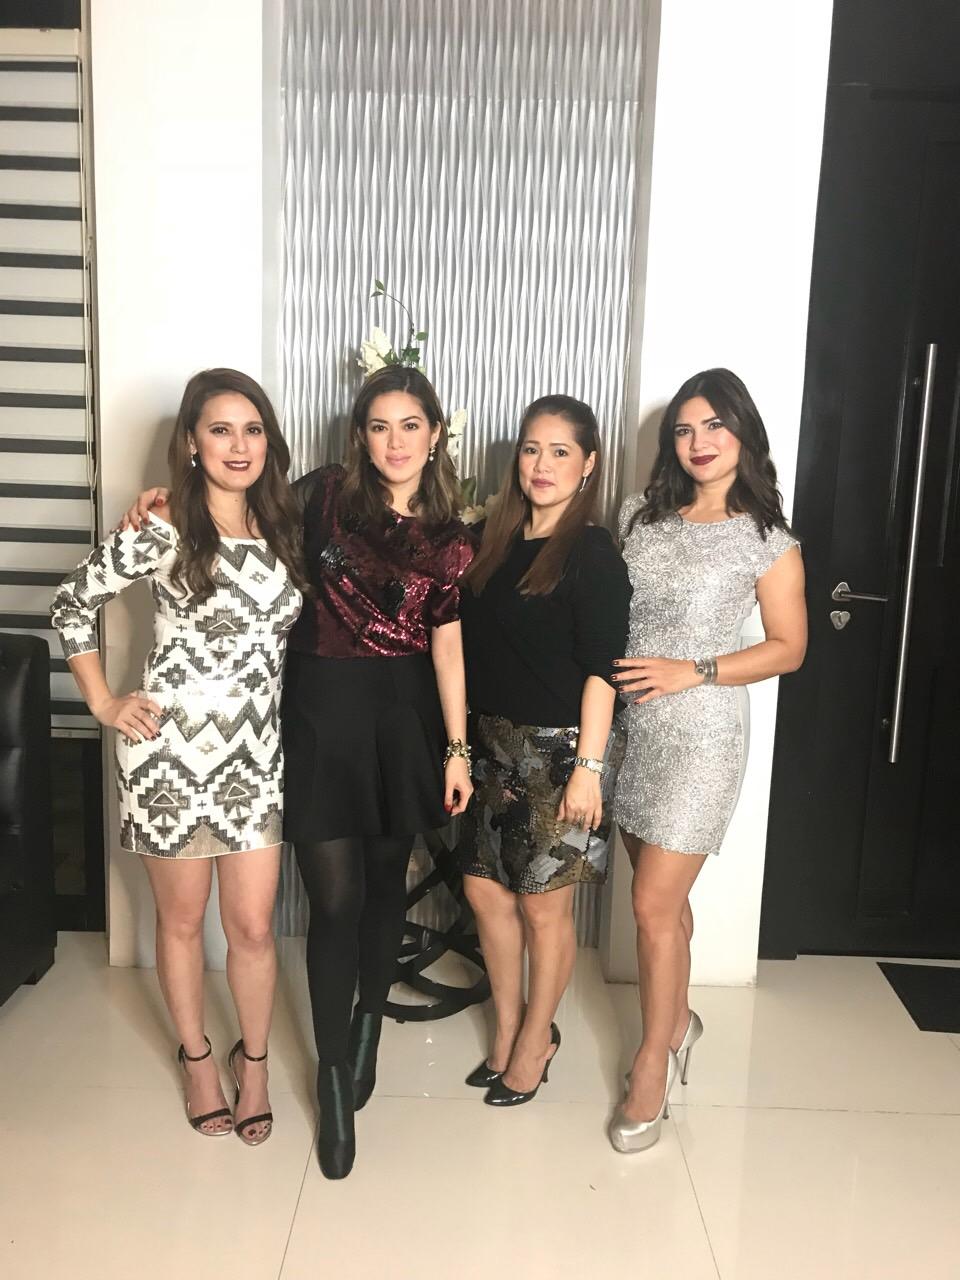 The women behind Ystilo salon – Sheryl, Shaina, Sheila Magdayo, and Vina Morales